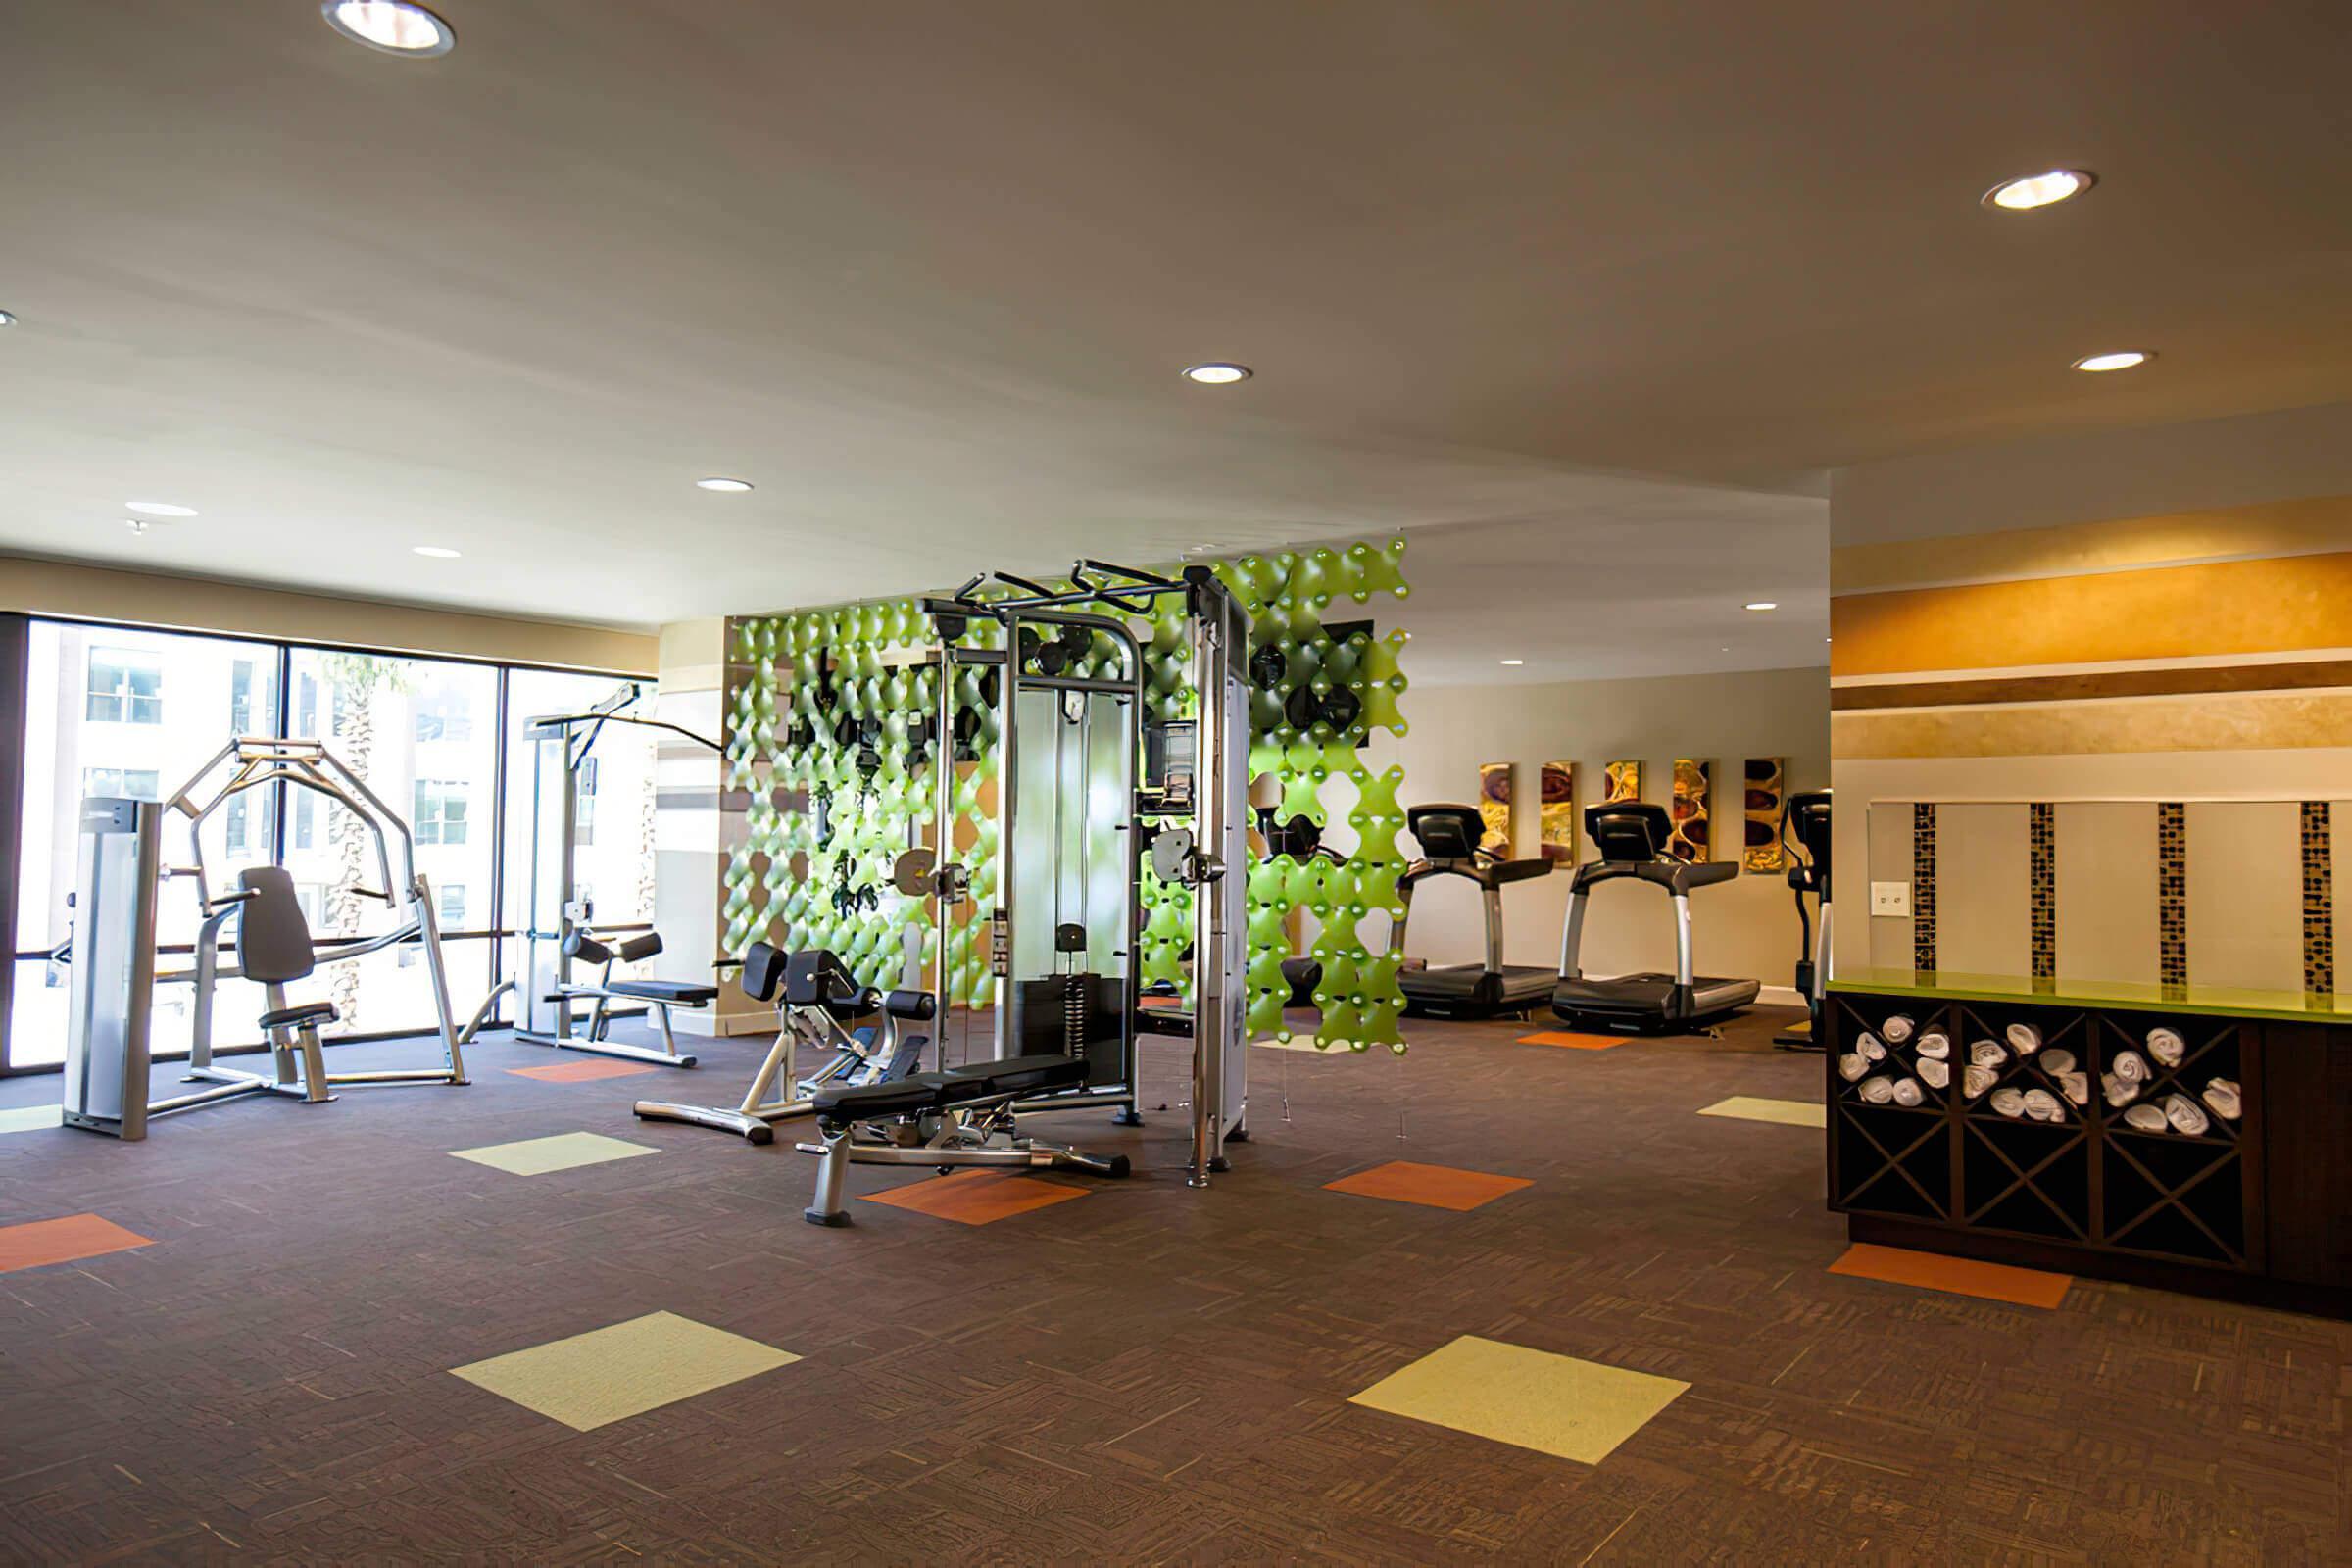 San Antigua Day 3 Fitness Center Angle 3-width-2400px.jpg